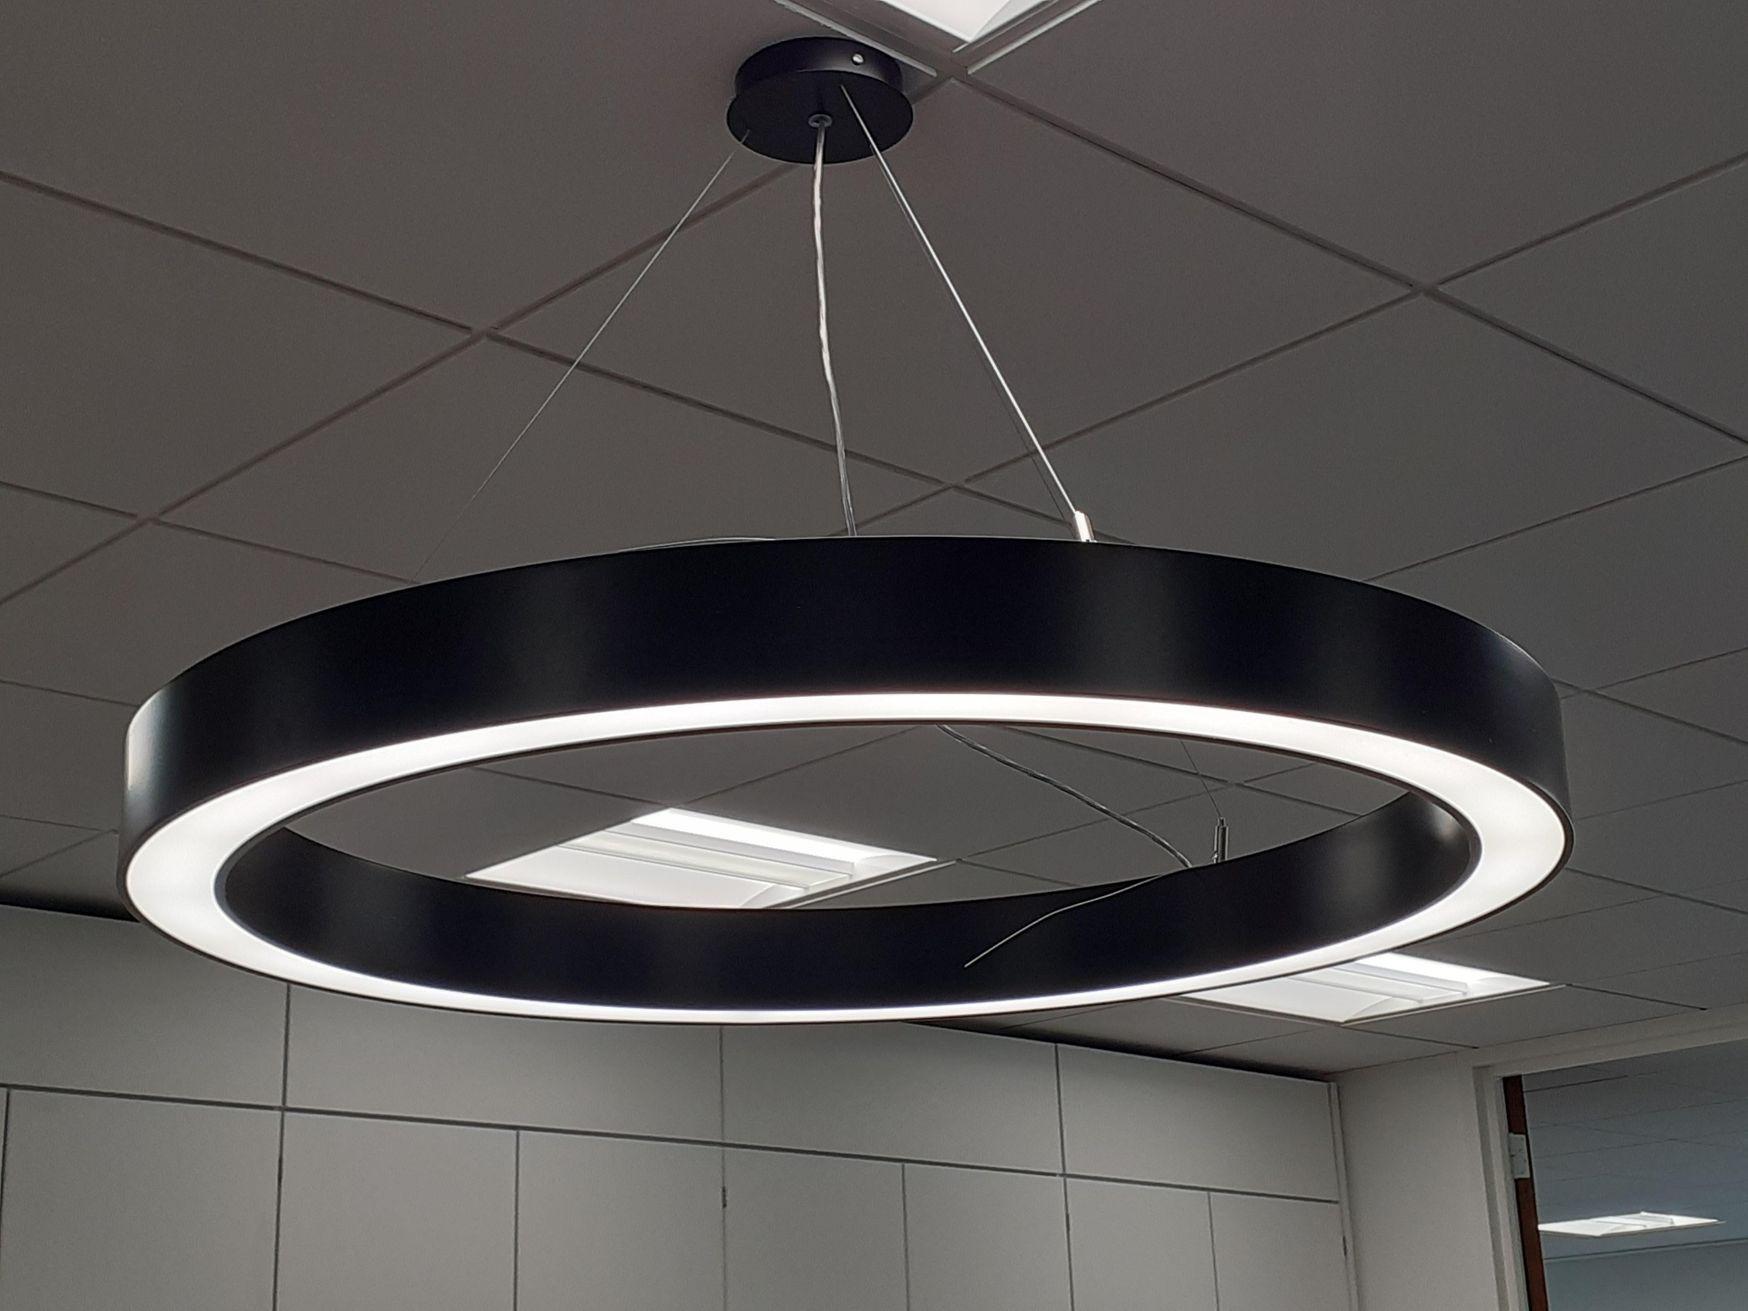 Contemporary design suspended Mount 'Halo' lights 650mm diameter